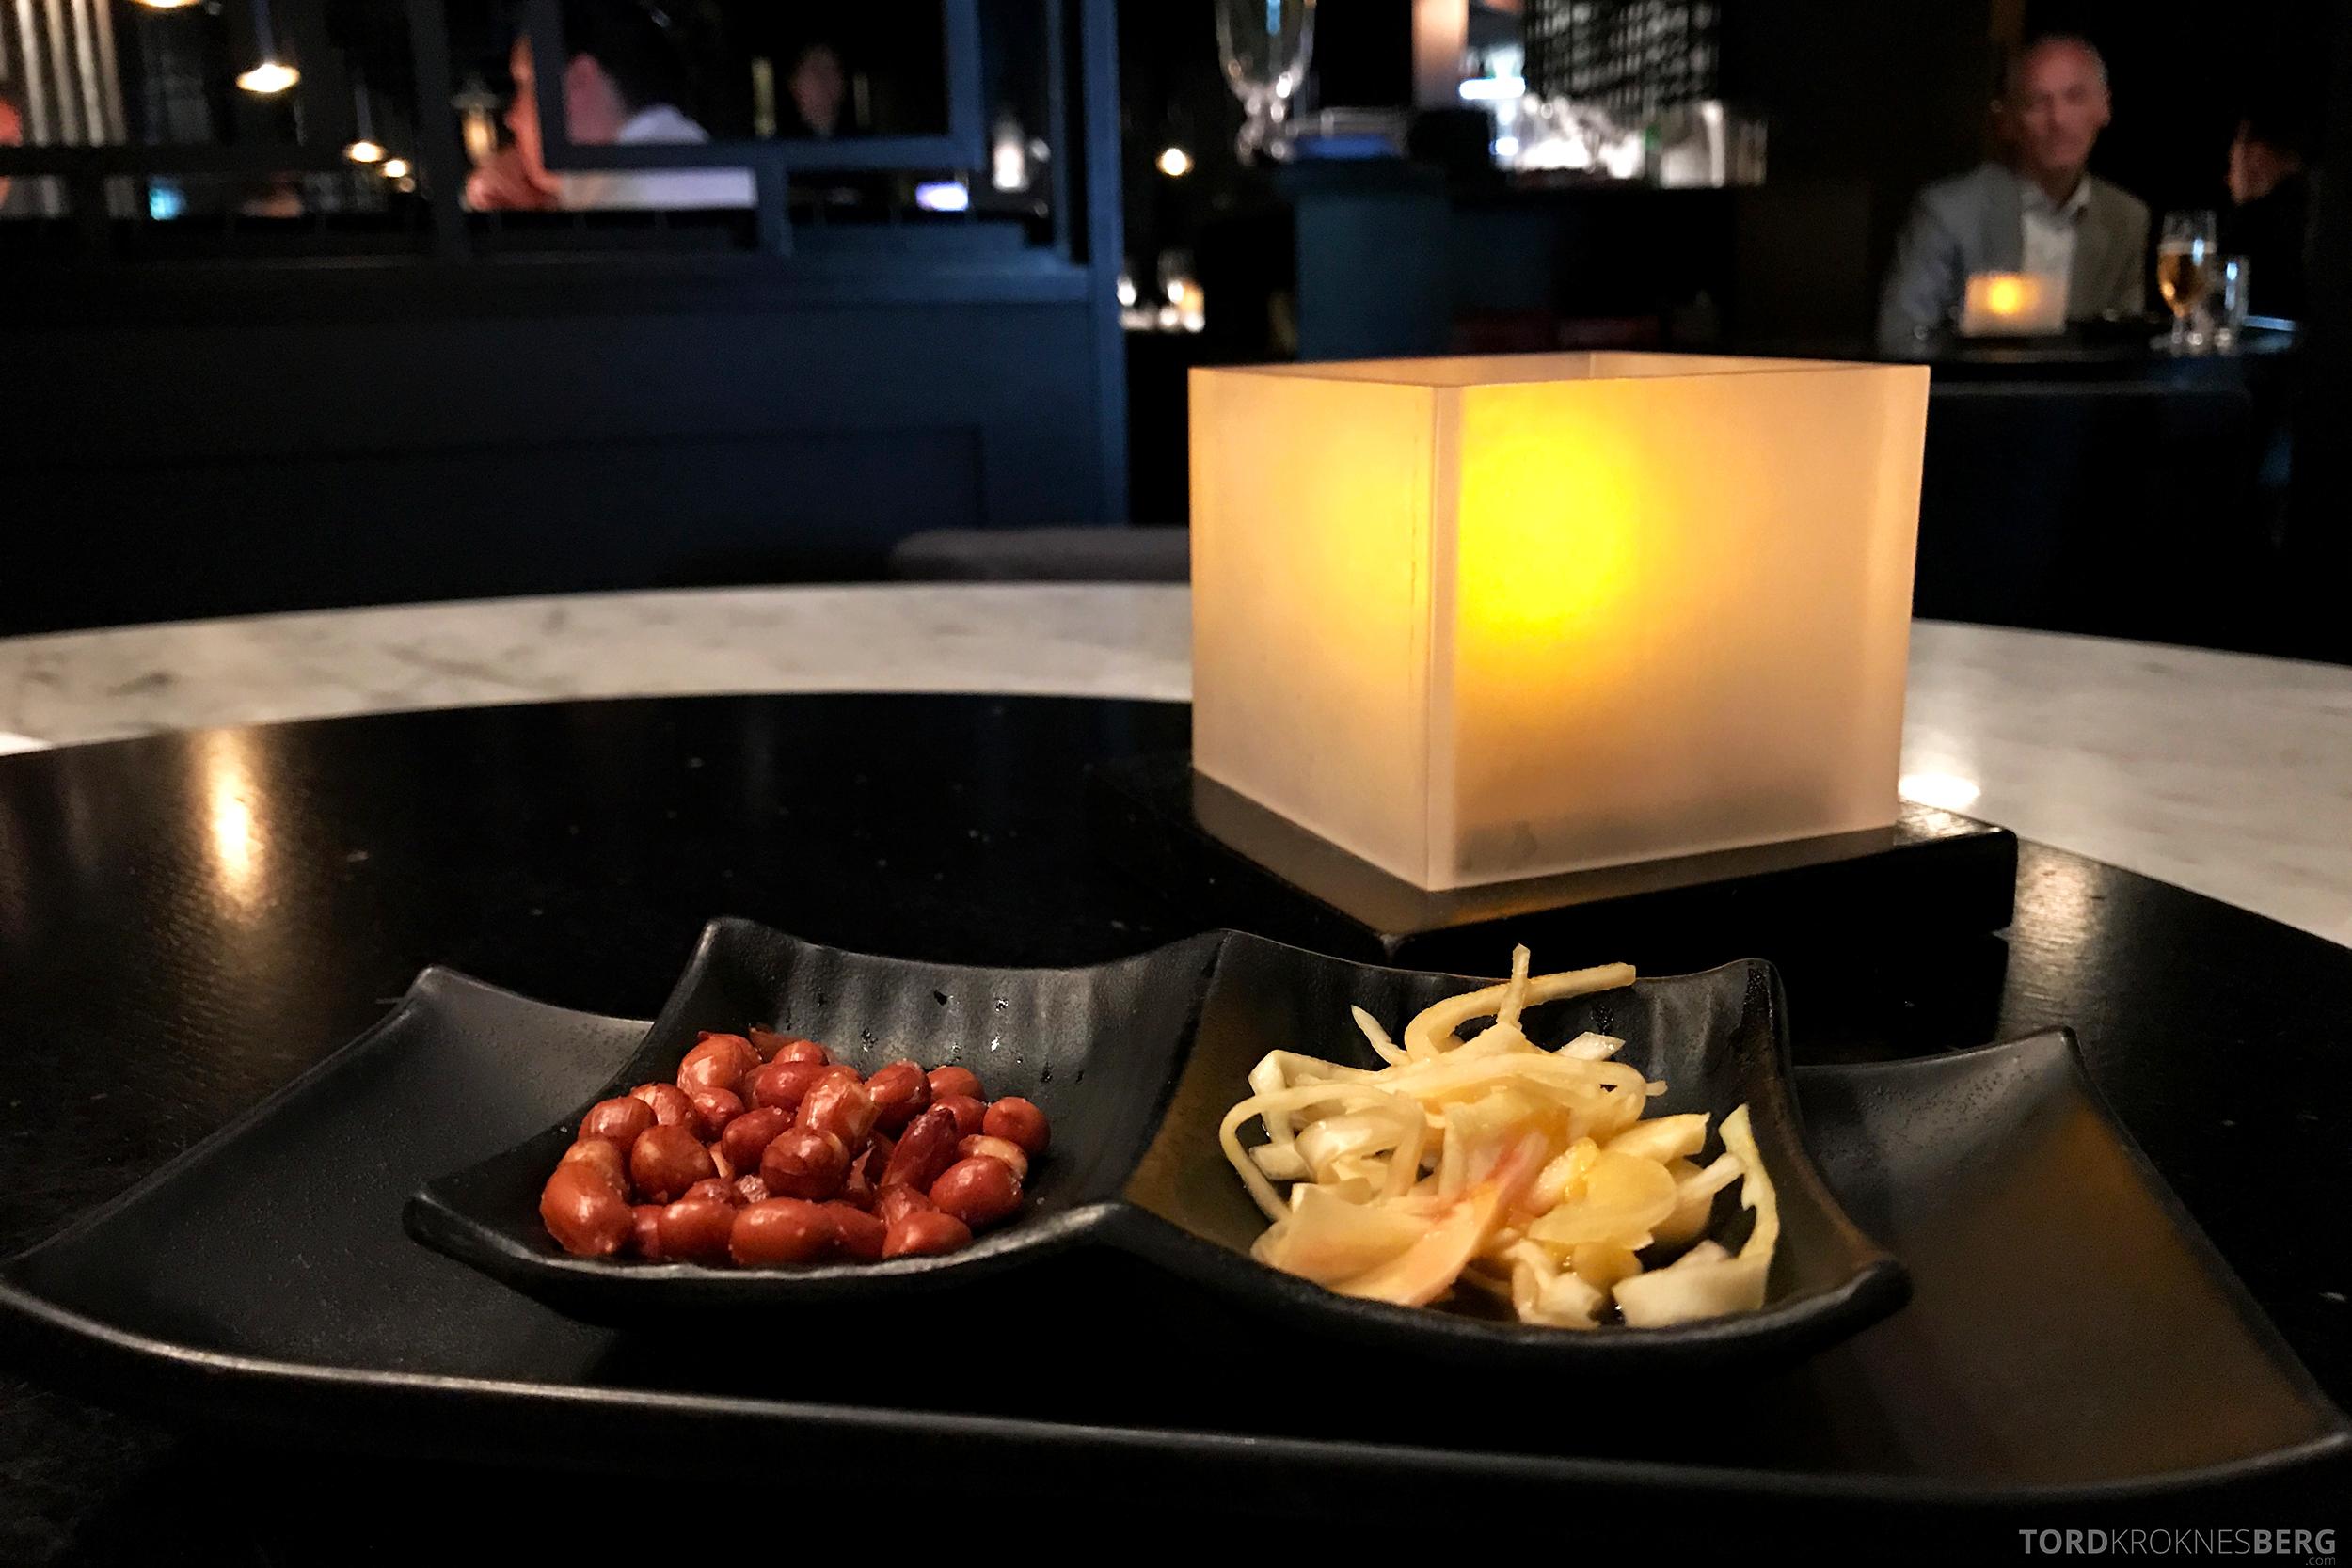 koselig restaurant oslo escort service oslo